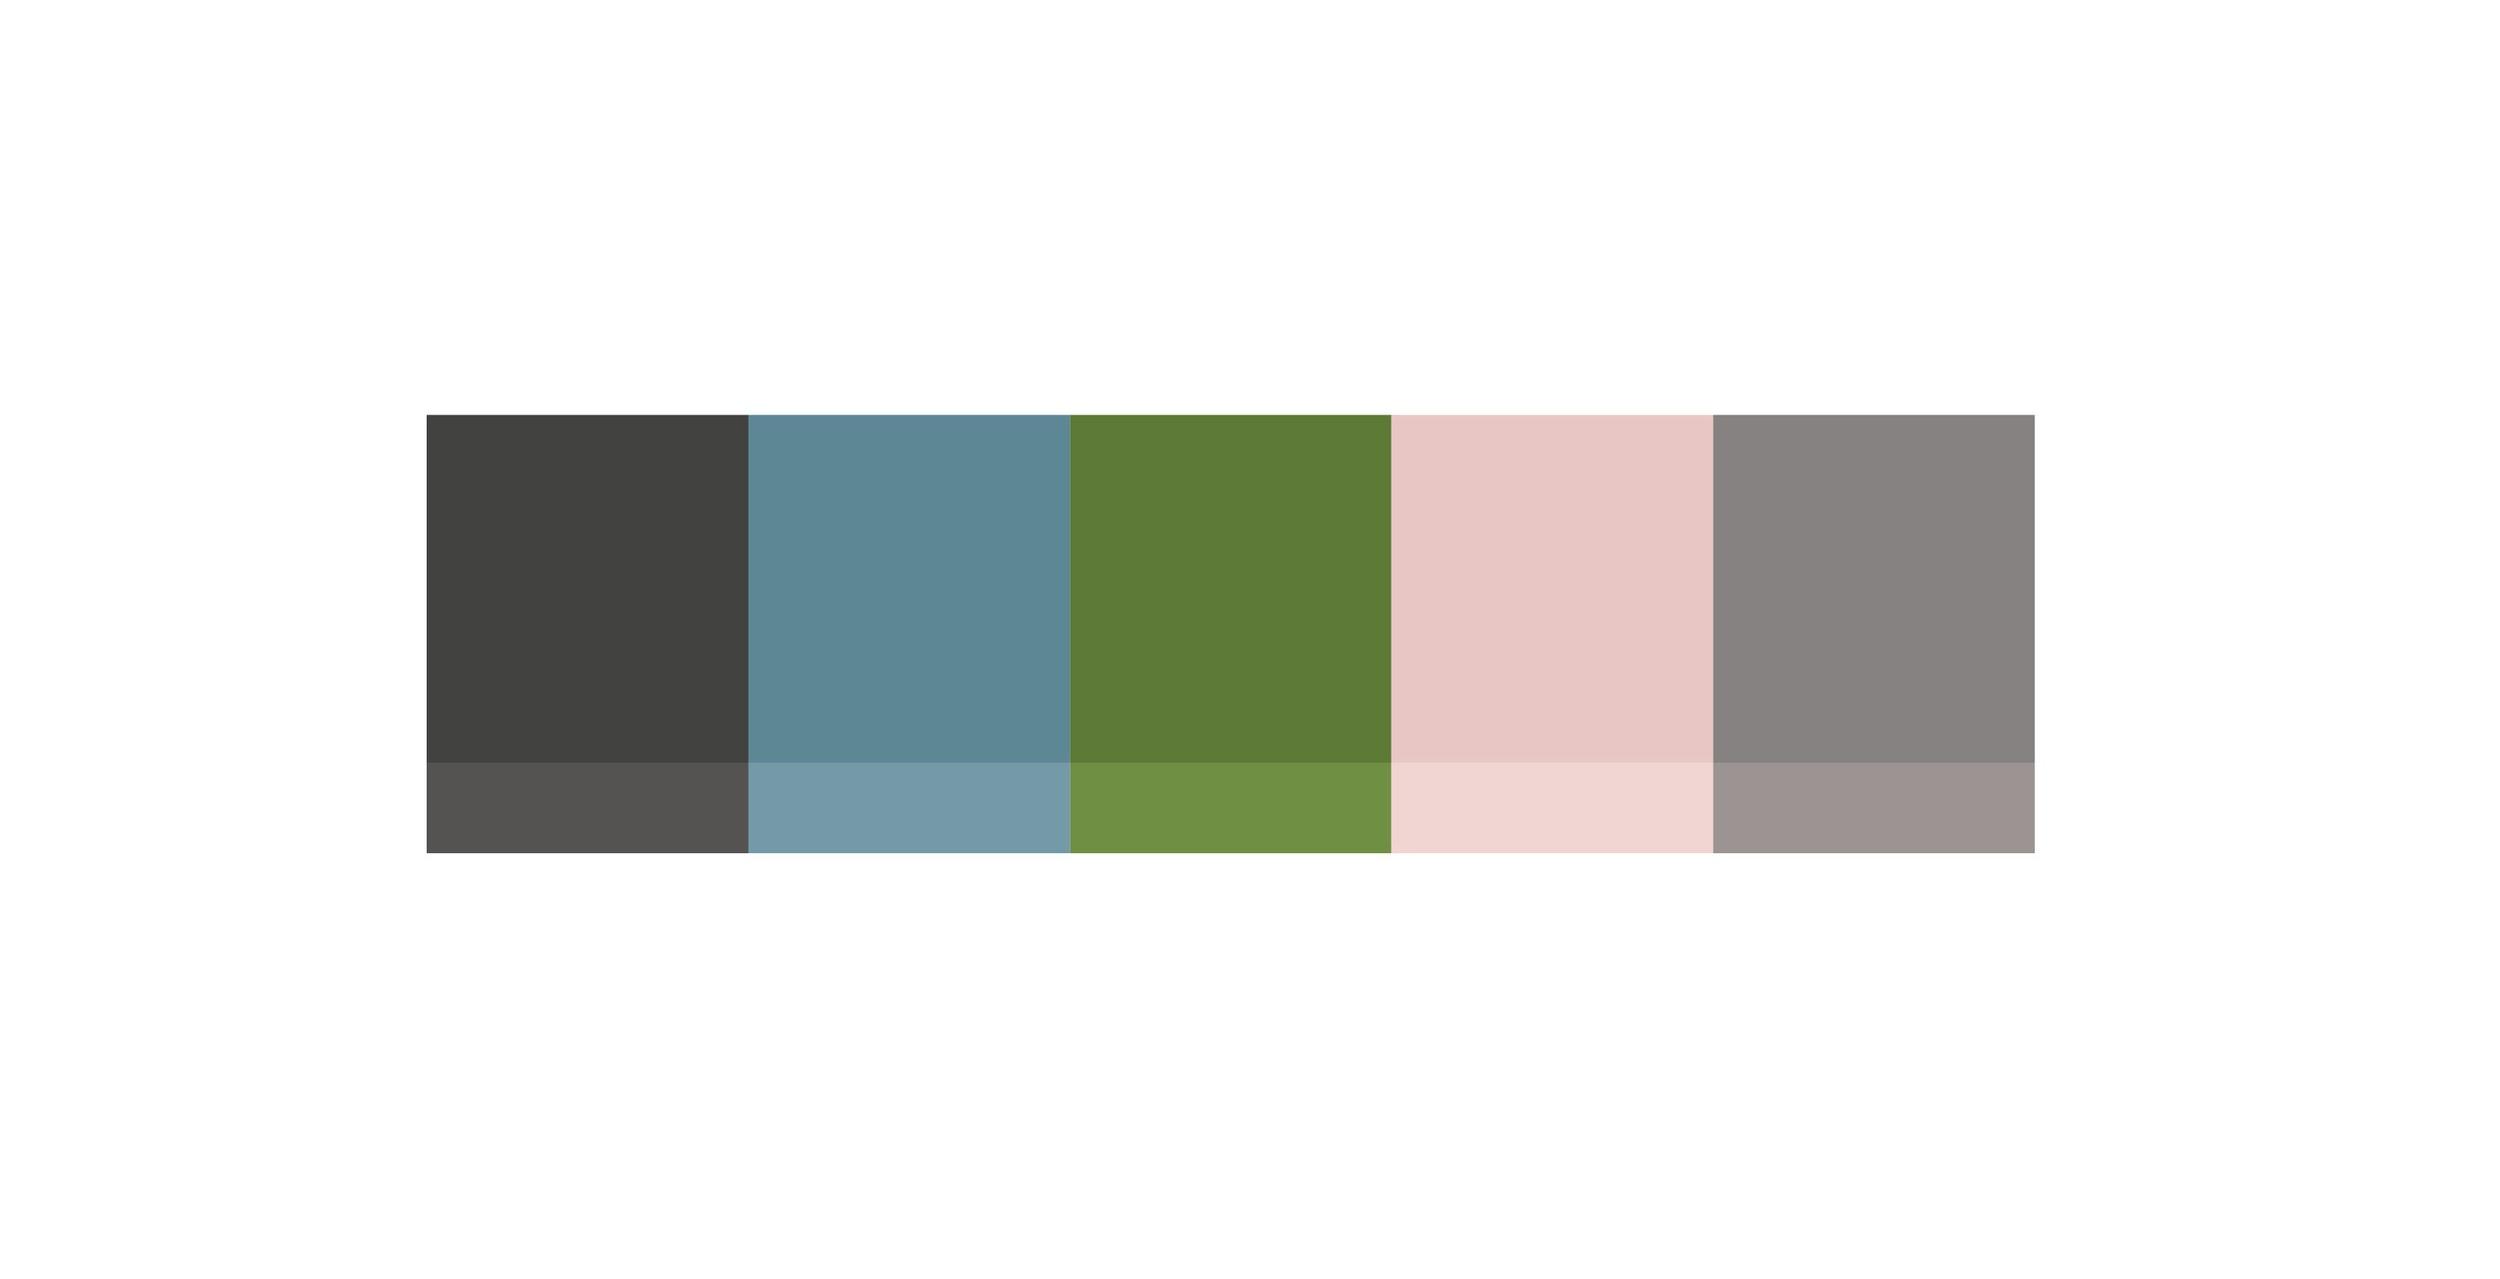 LynseyCreative_SmithHousePhoto_Portfolio_colorpalette.jpg